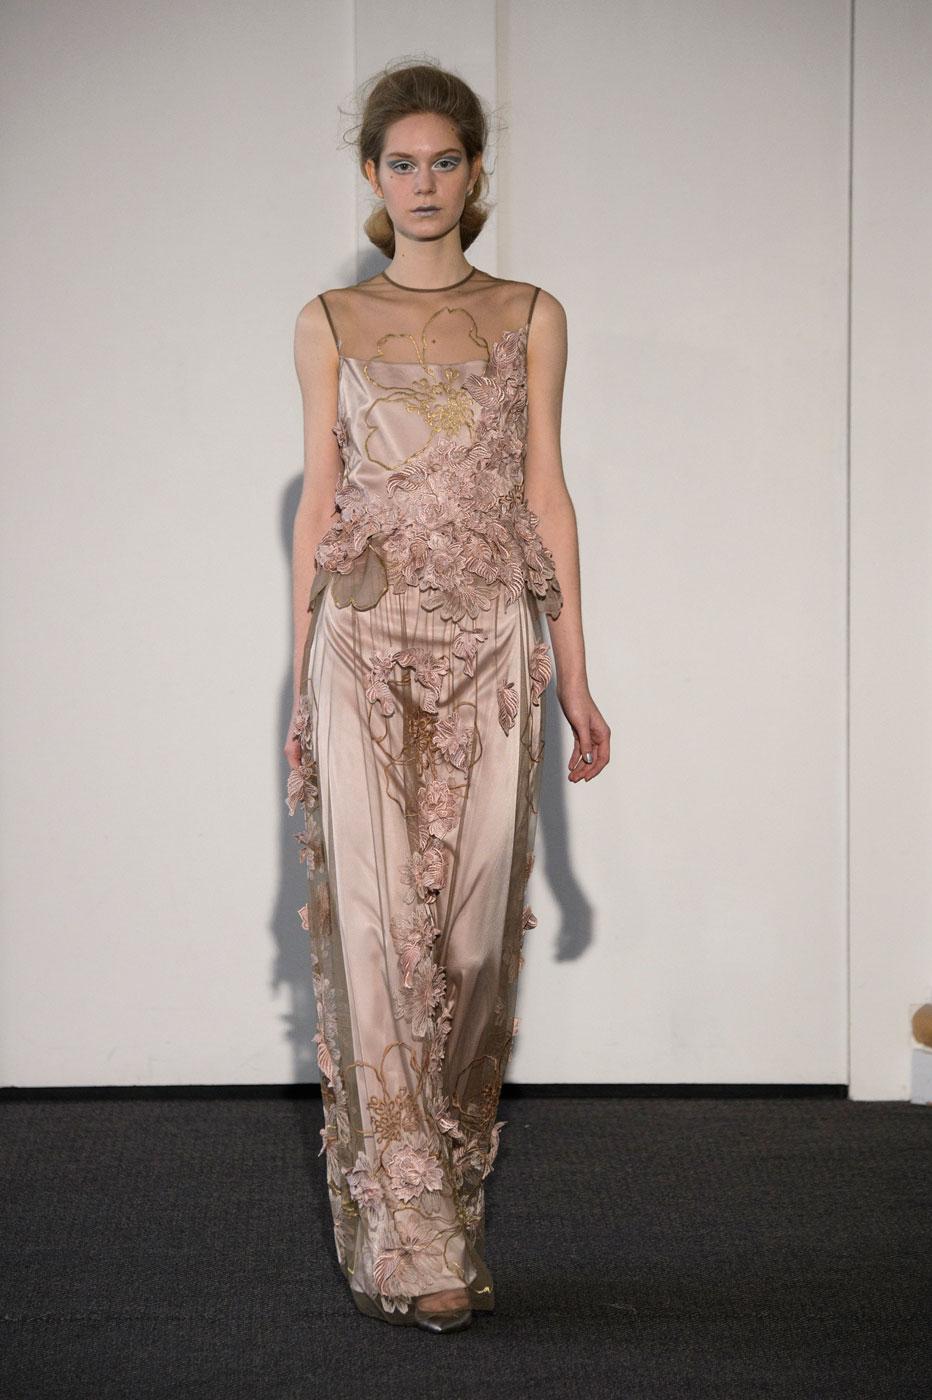 Busardi-fashion-runway-show-haute-couture-paris-spring-2015-the-impression-43